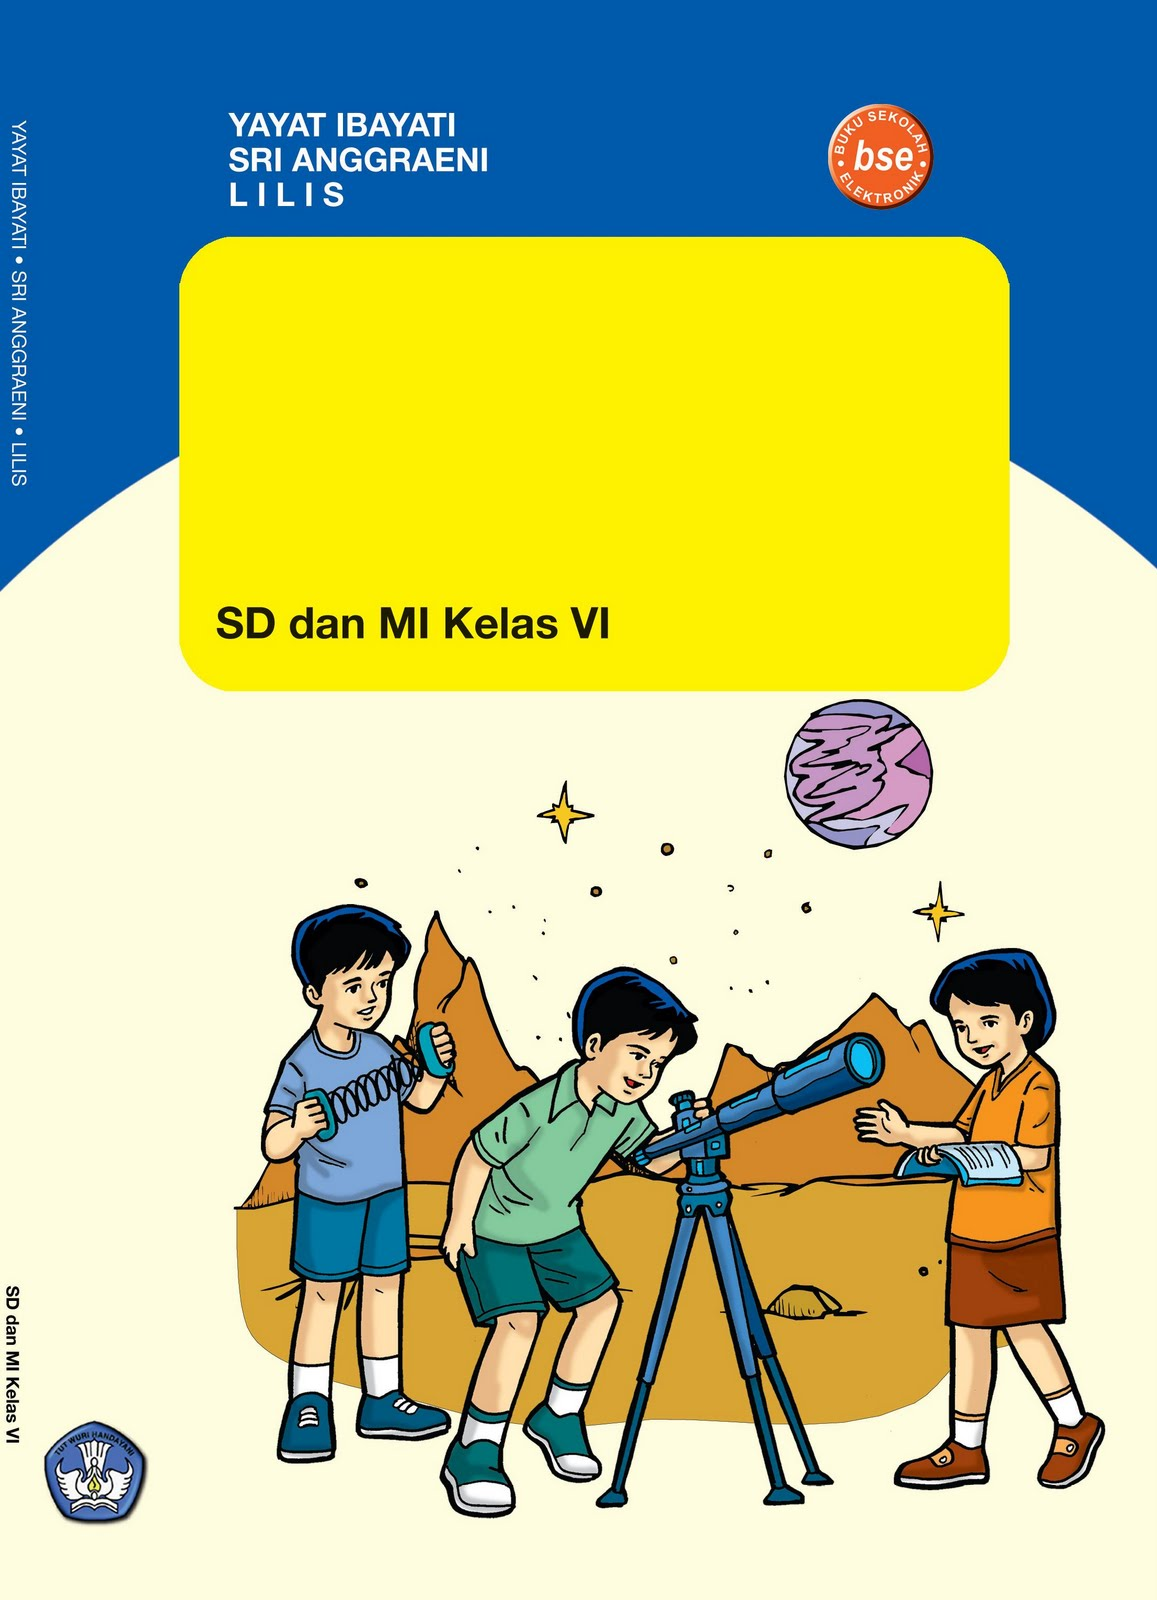 free download bse ipa kelas 5 sd